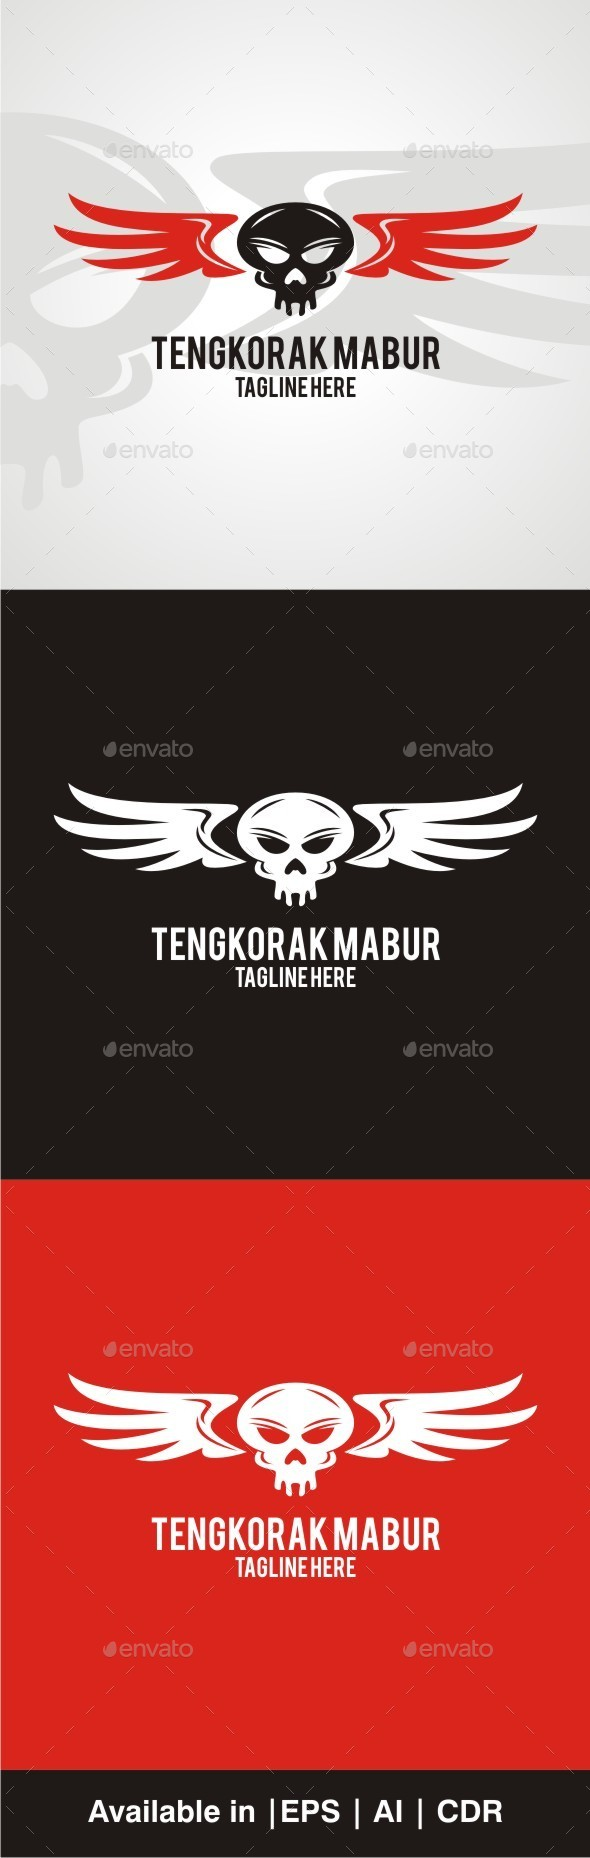 GraphicRiver Tengkorak Mabur 10013841